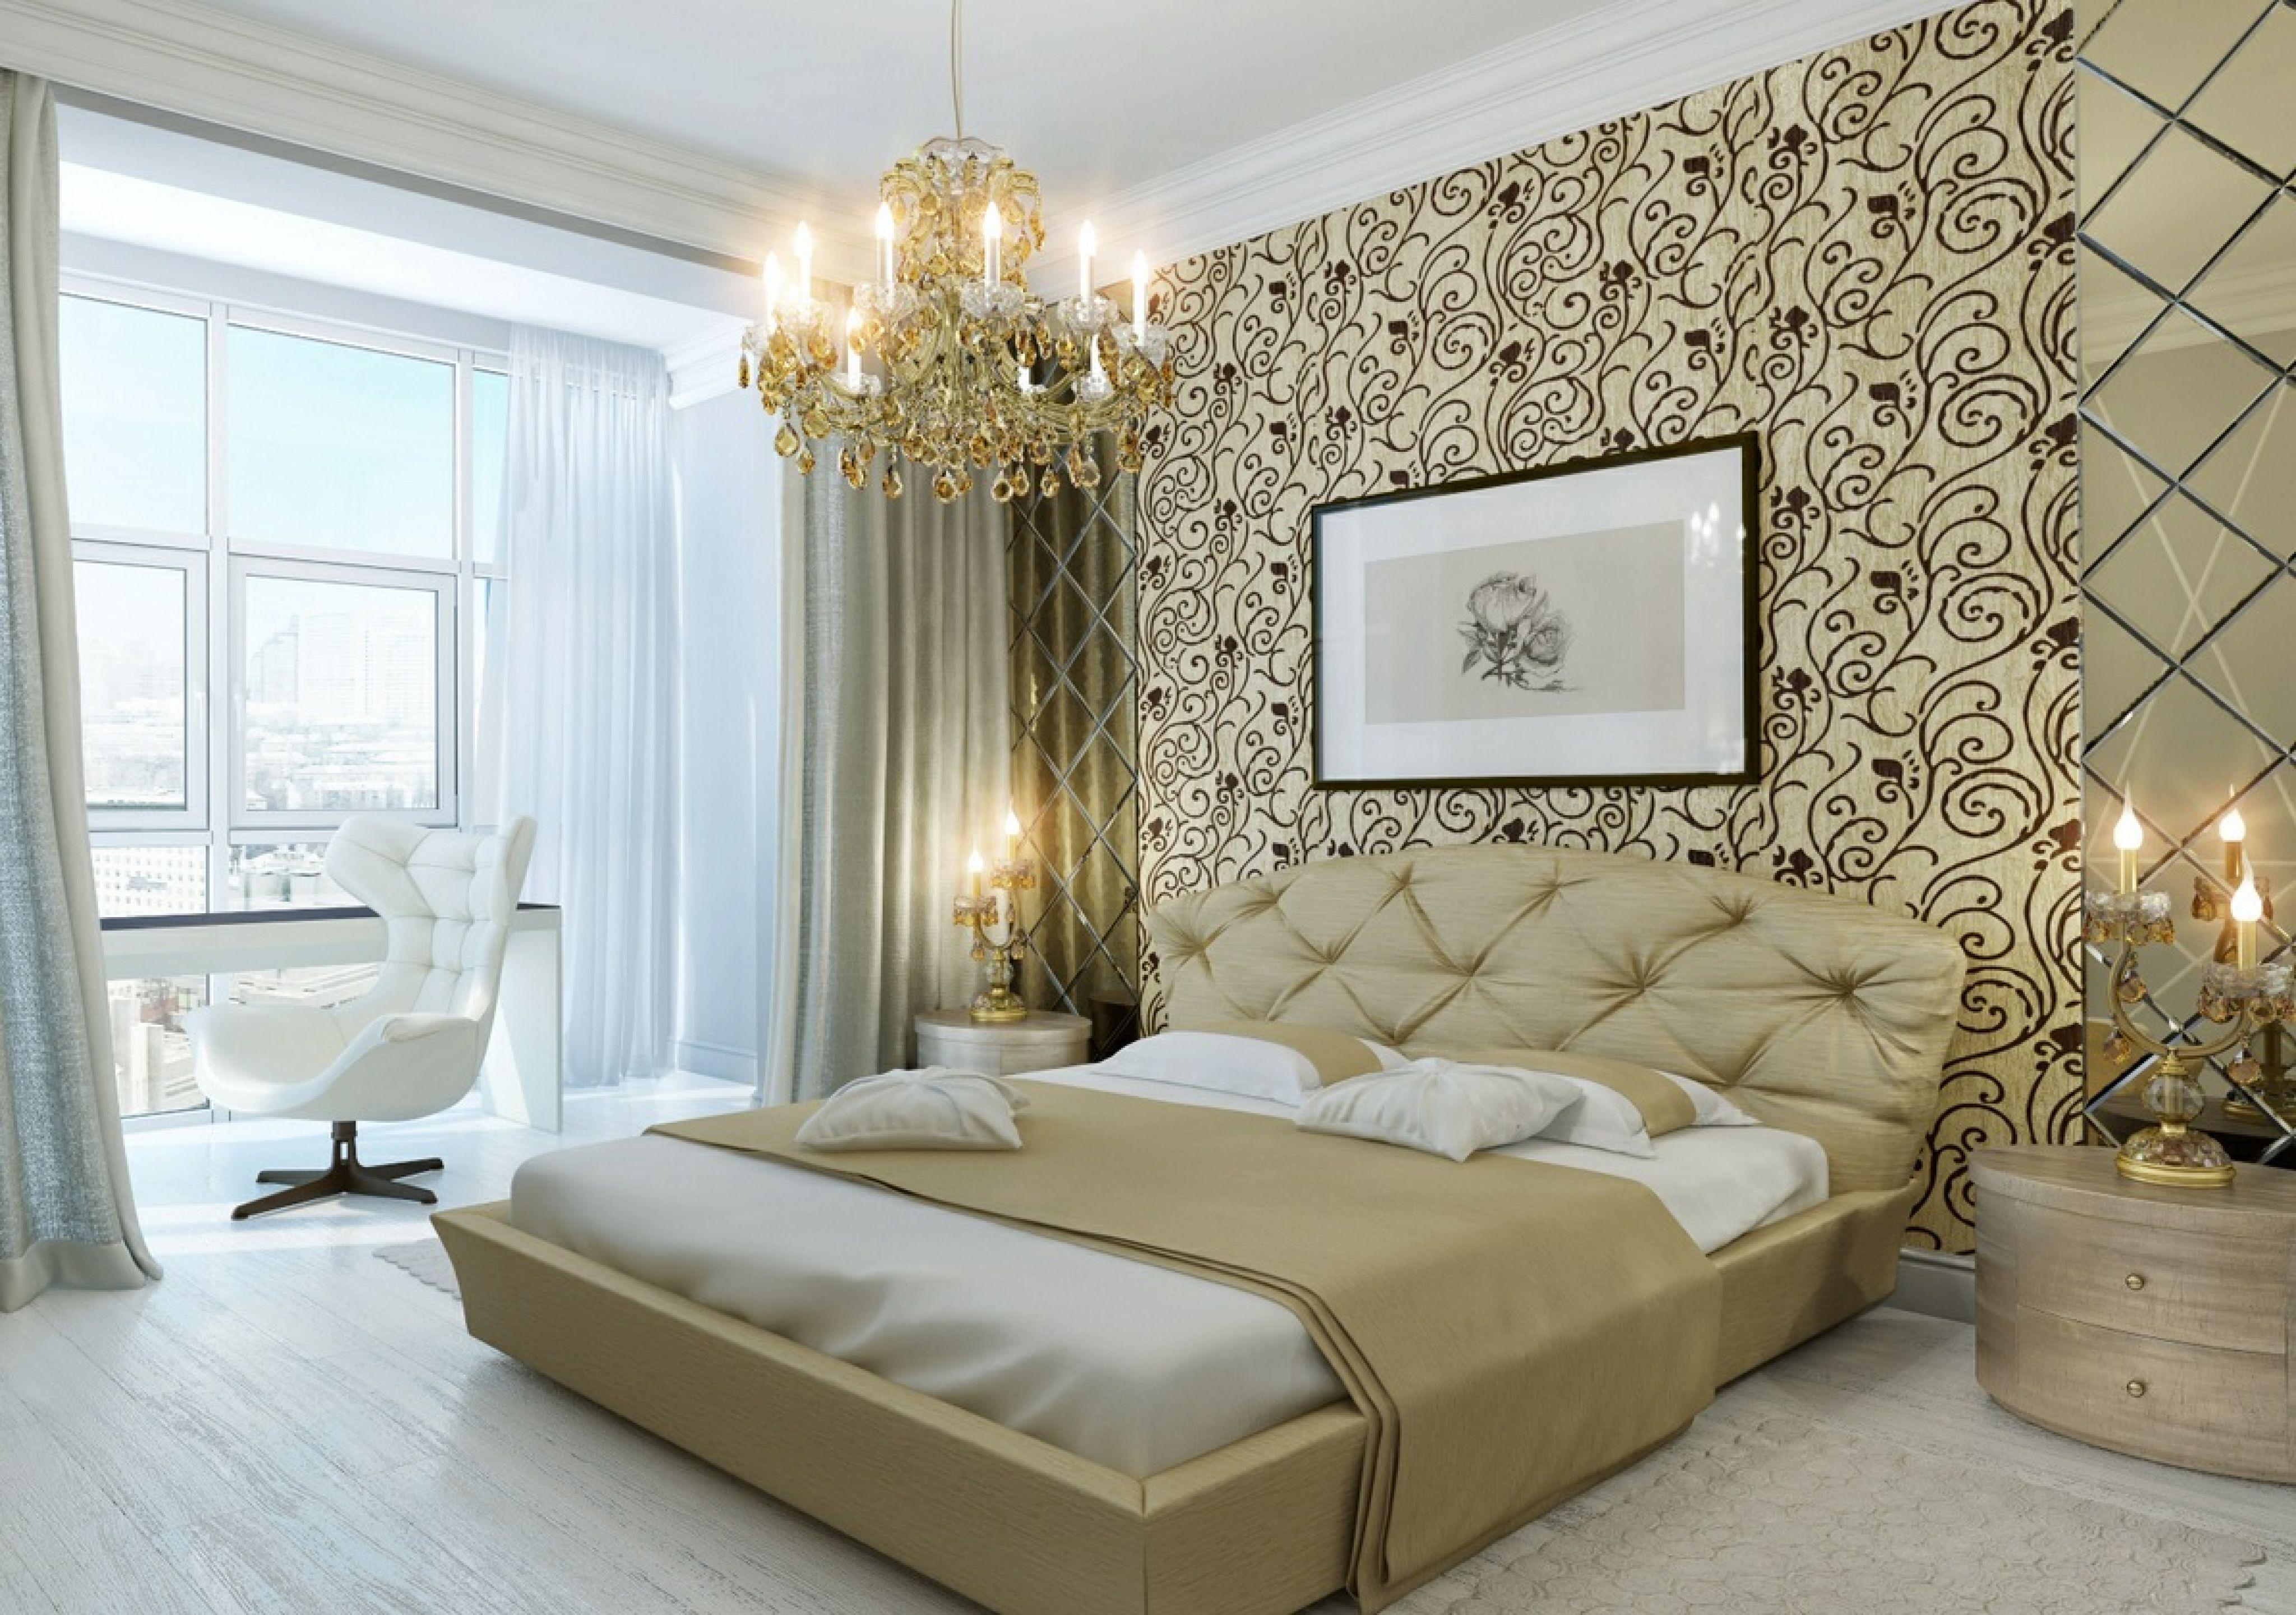 Classy Bedroom Designs